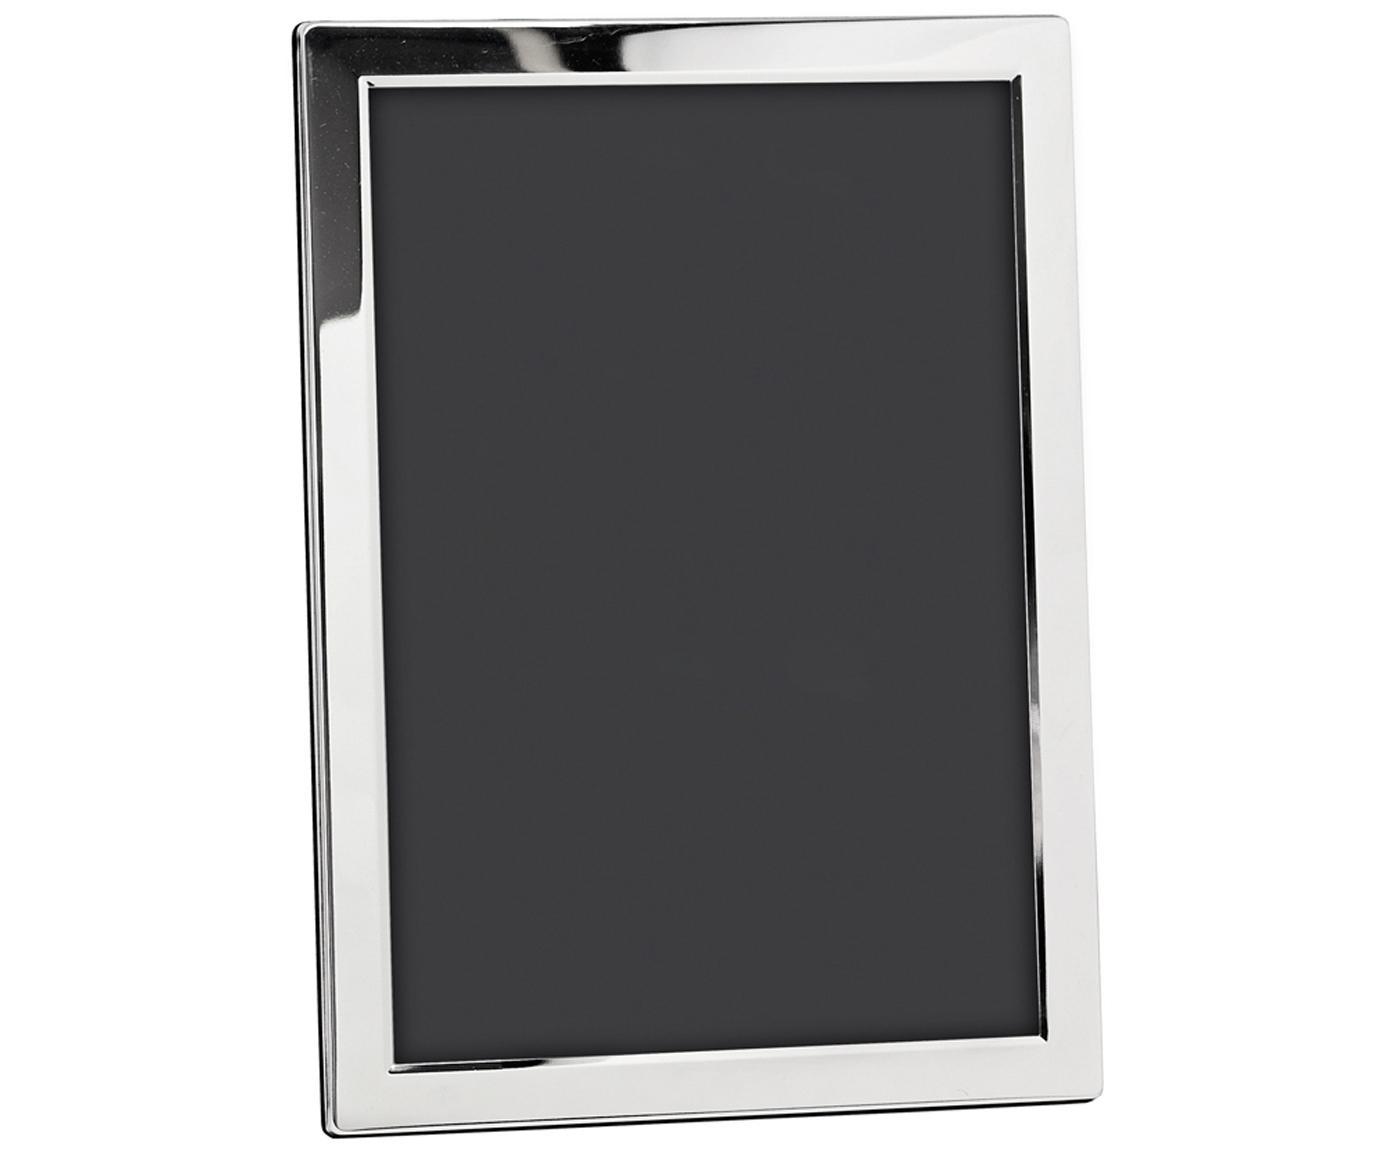 Fotolijstjes Carrara, Frame: verzilverd staal, Frame: zilverkleurig voorkant: transparant, 20 x 30 cm